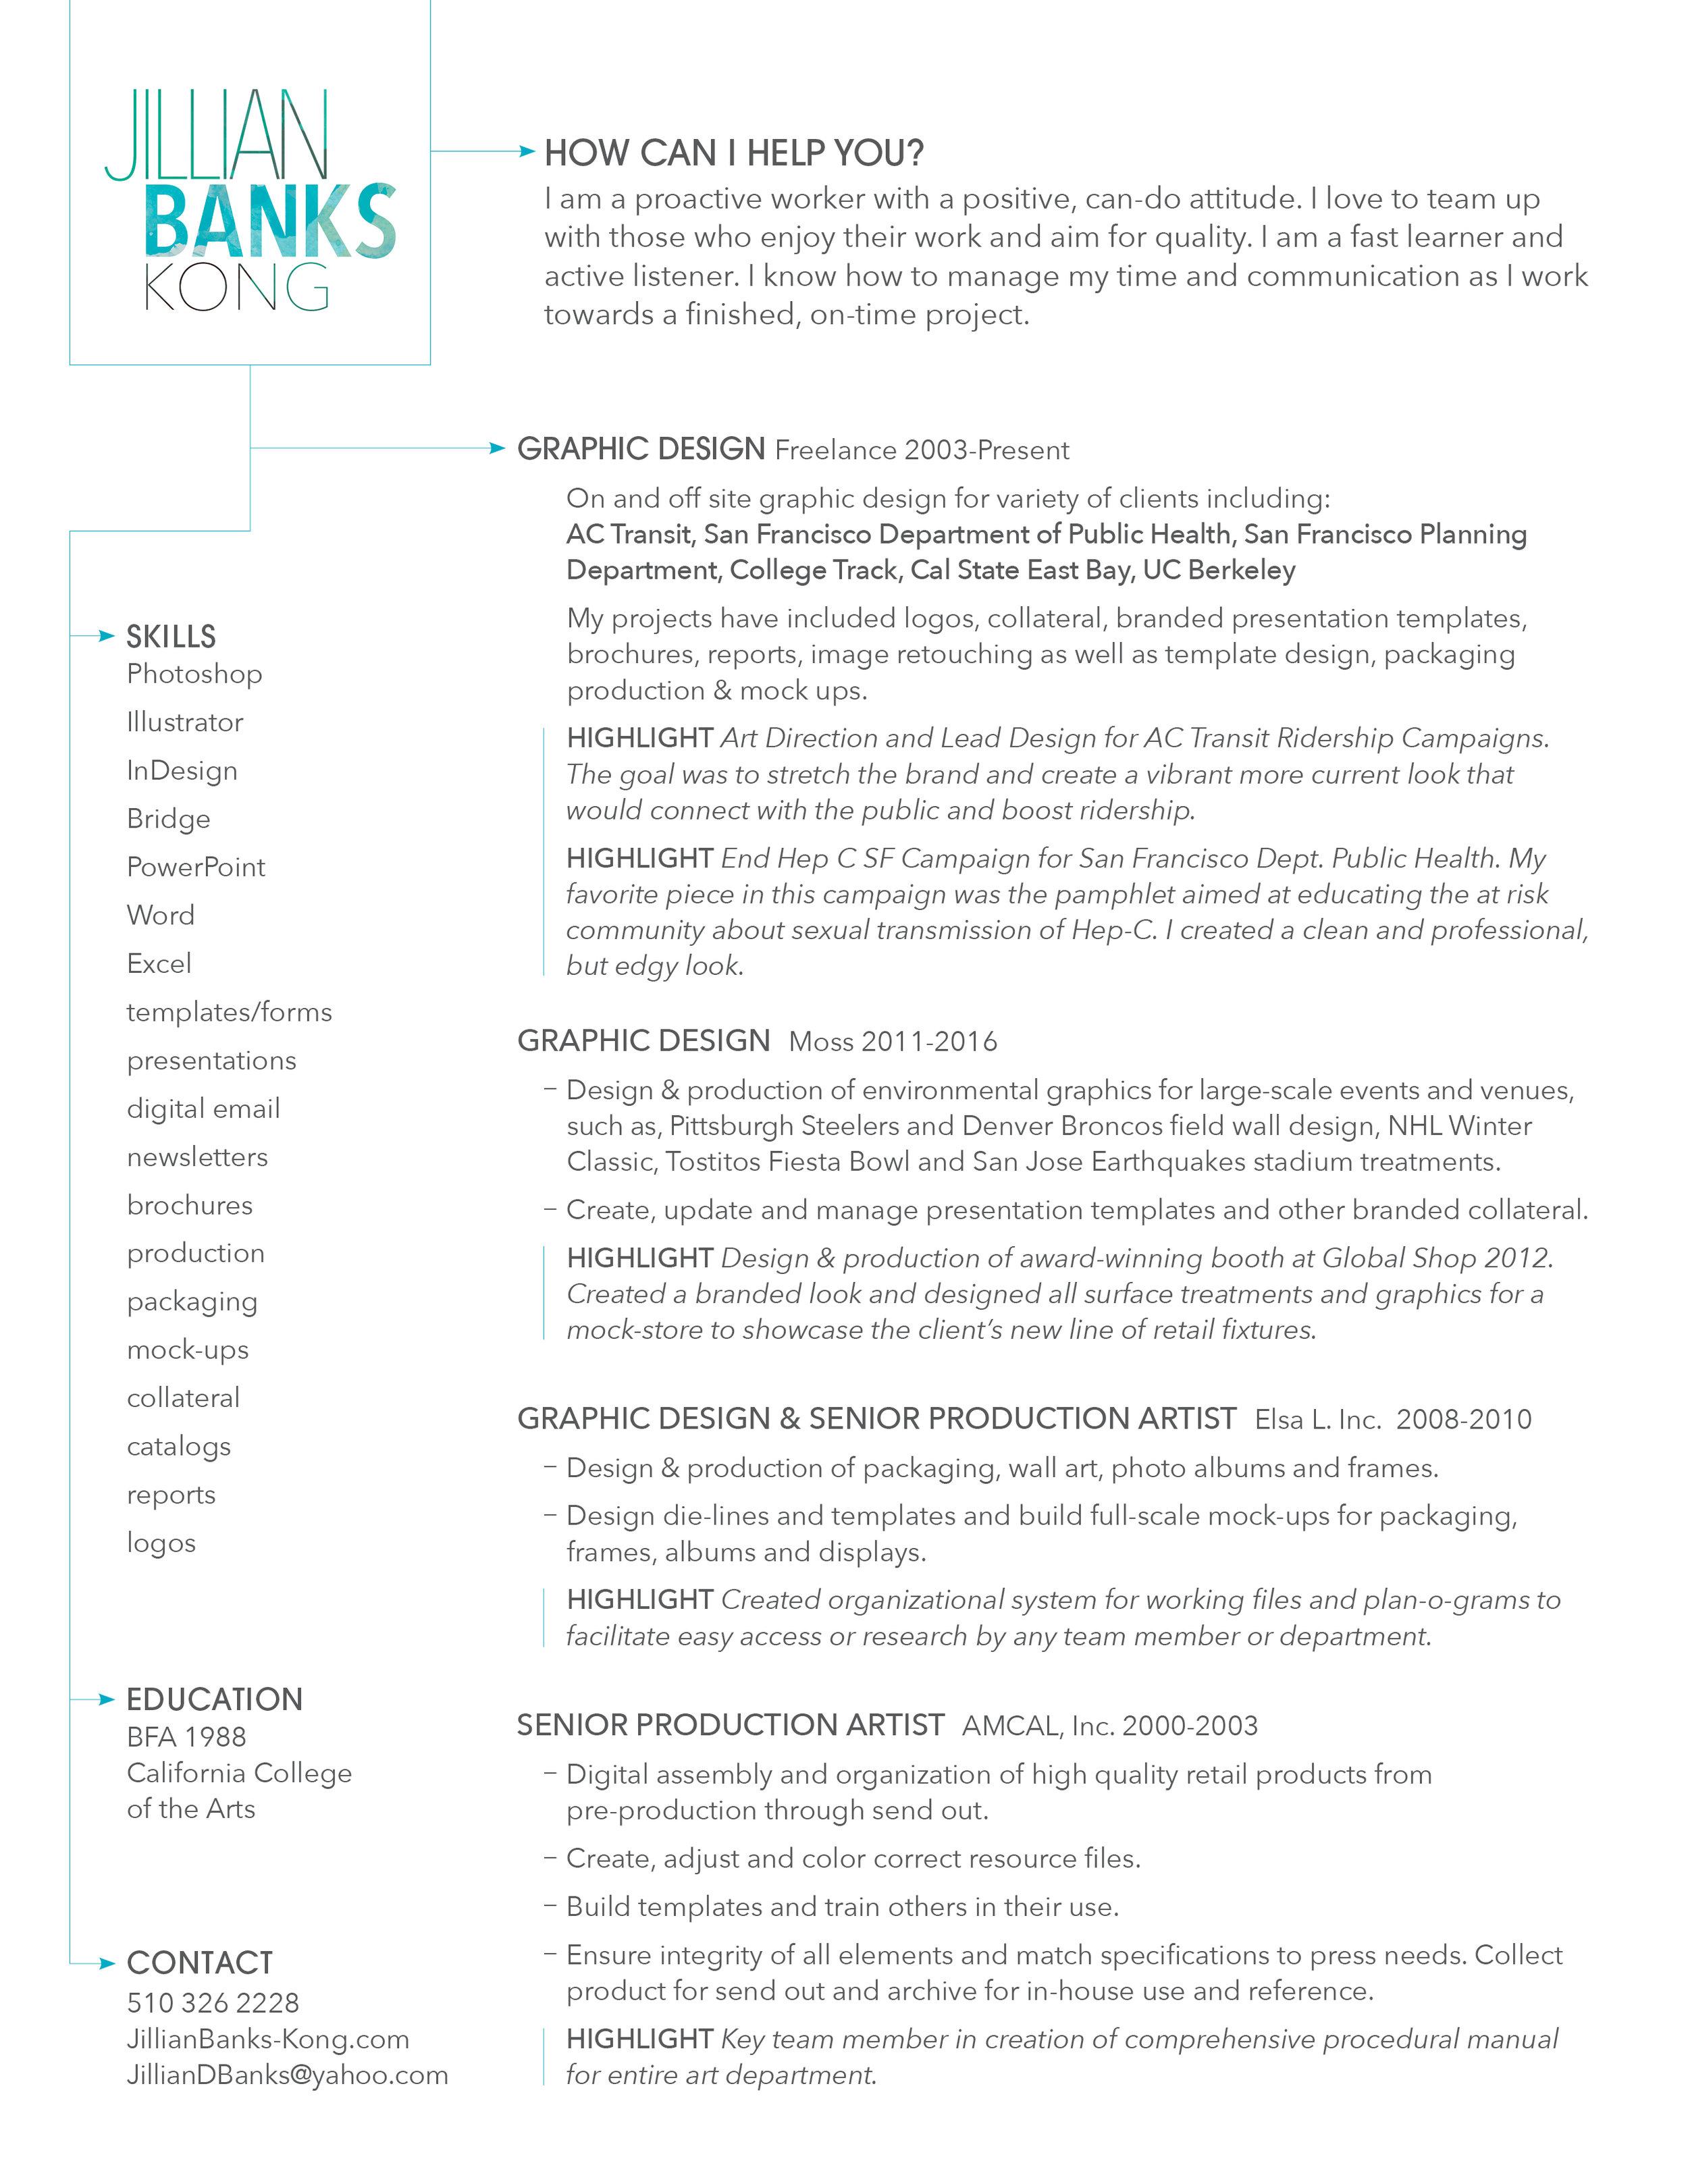 Resume_rev9_19.jpg